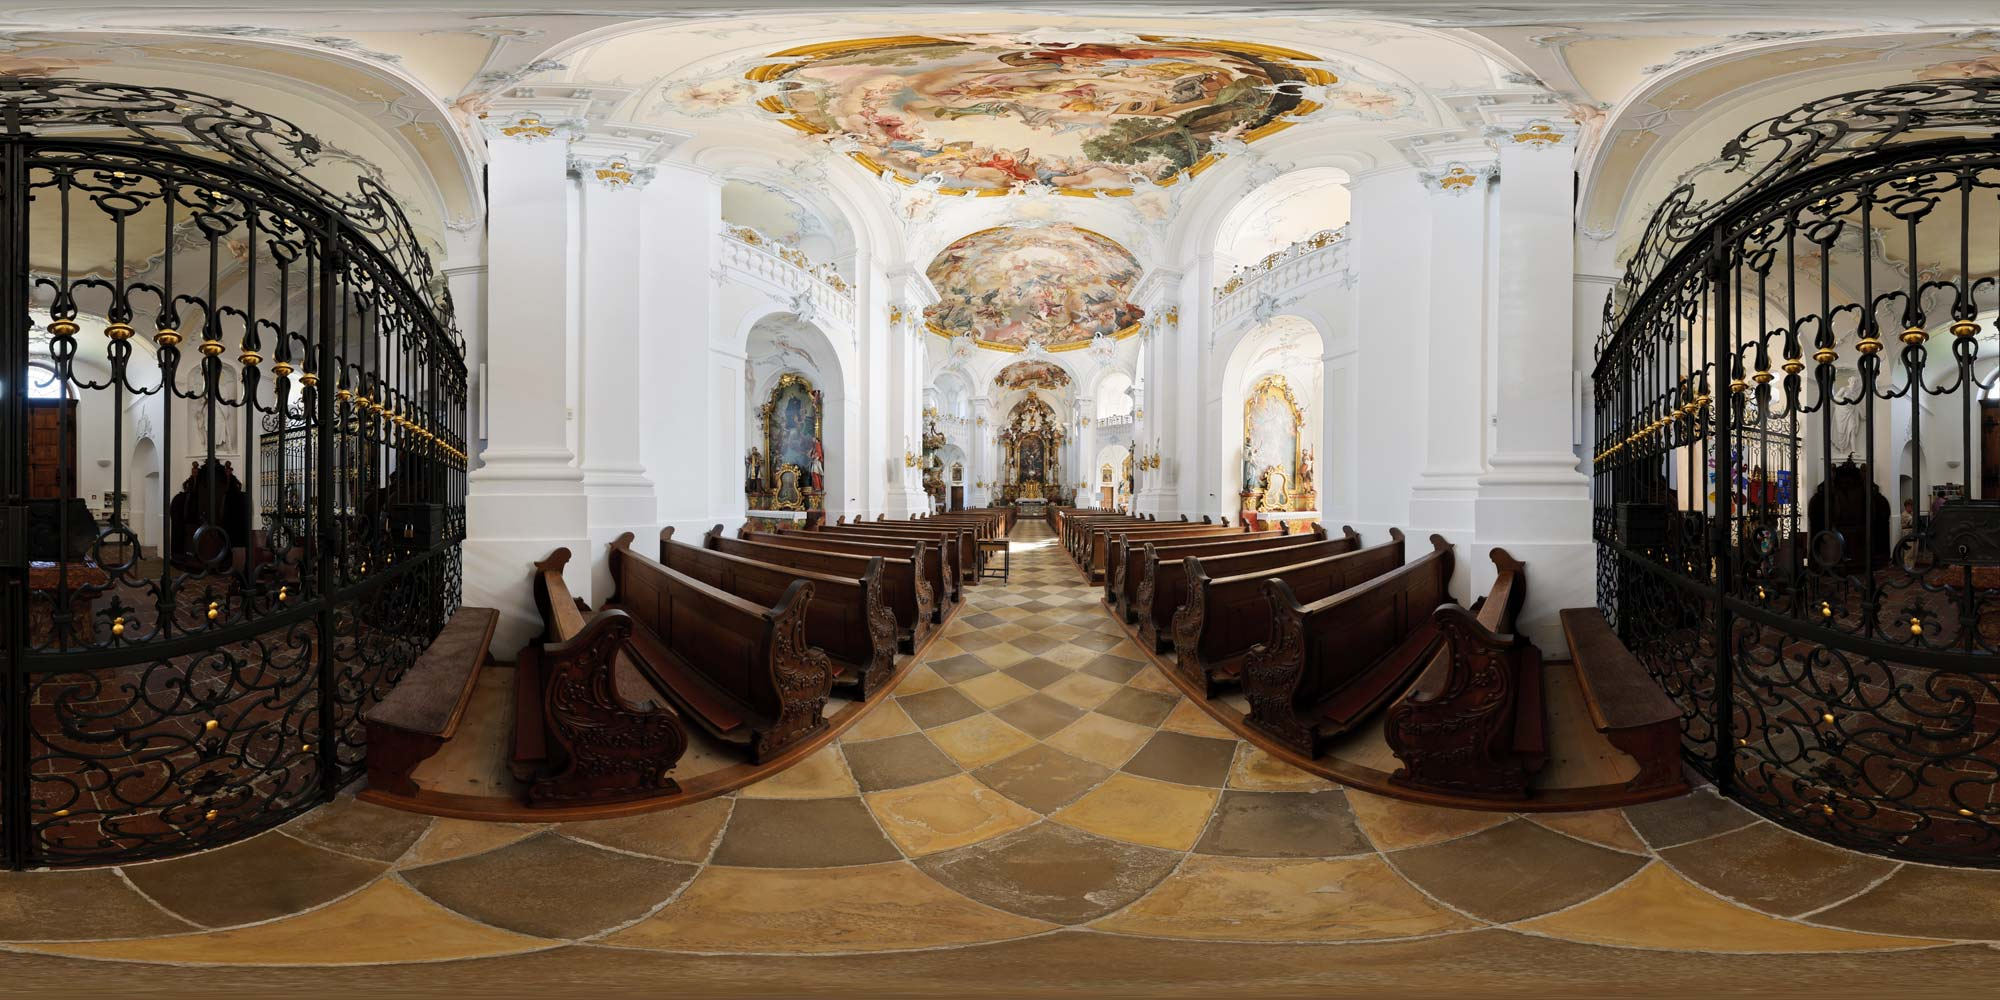 kubische panoramen panorama foto kloster rott am inn klosterkirche. Black Bedroom Furniture Sets. Home Design Ideas